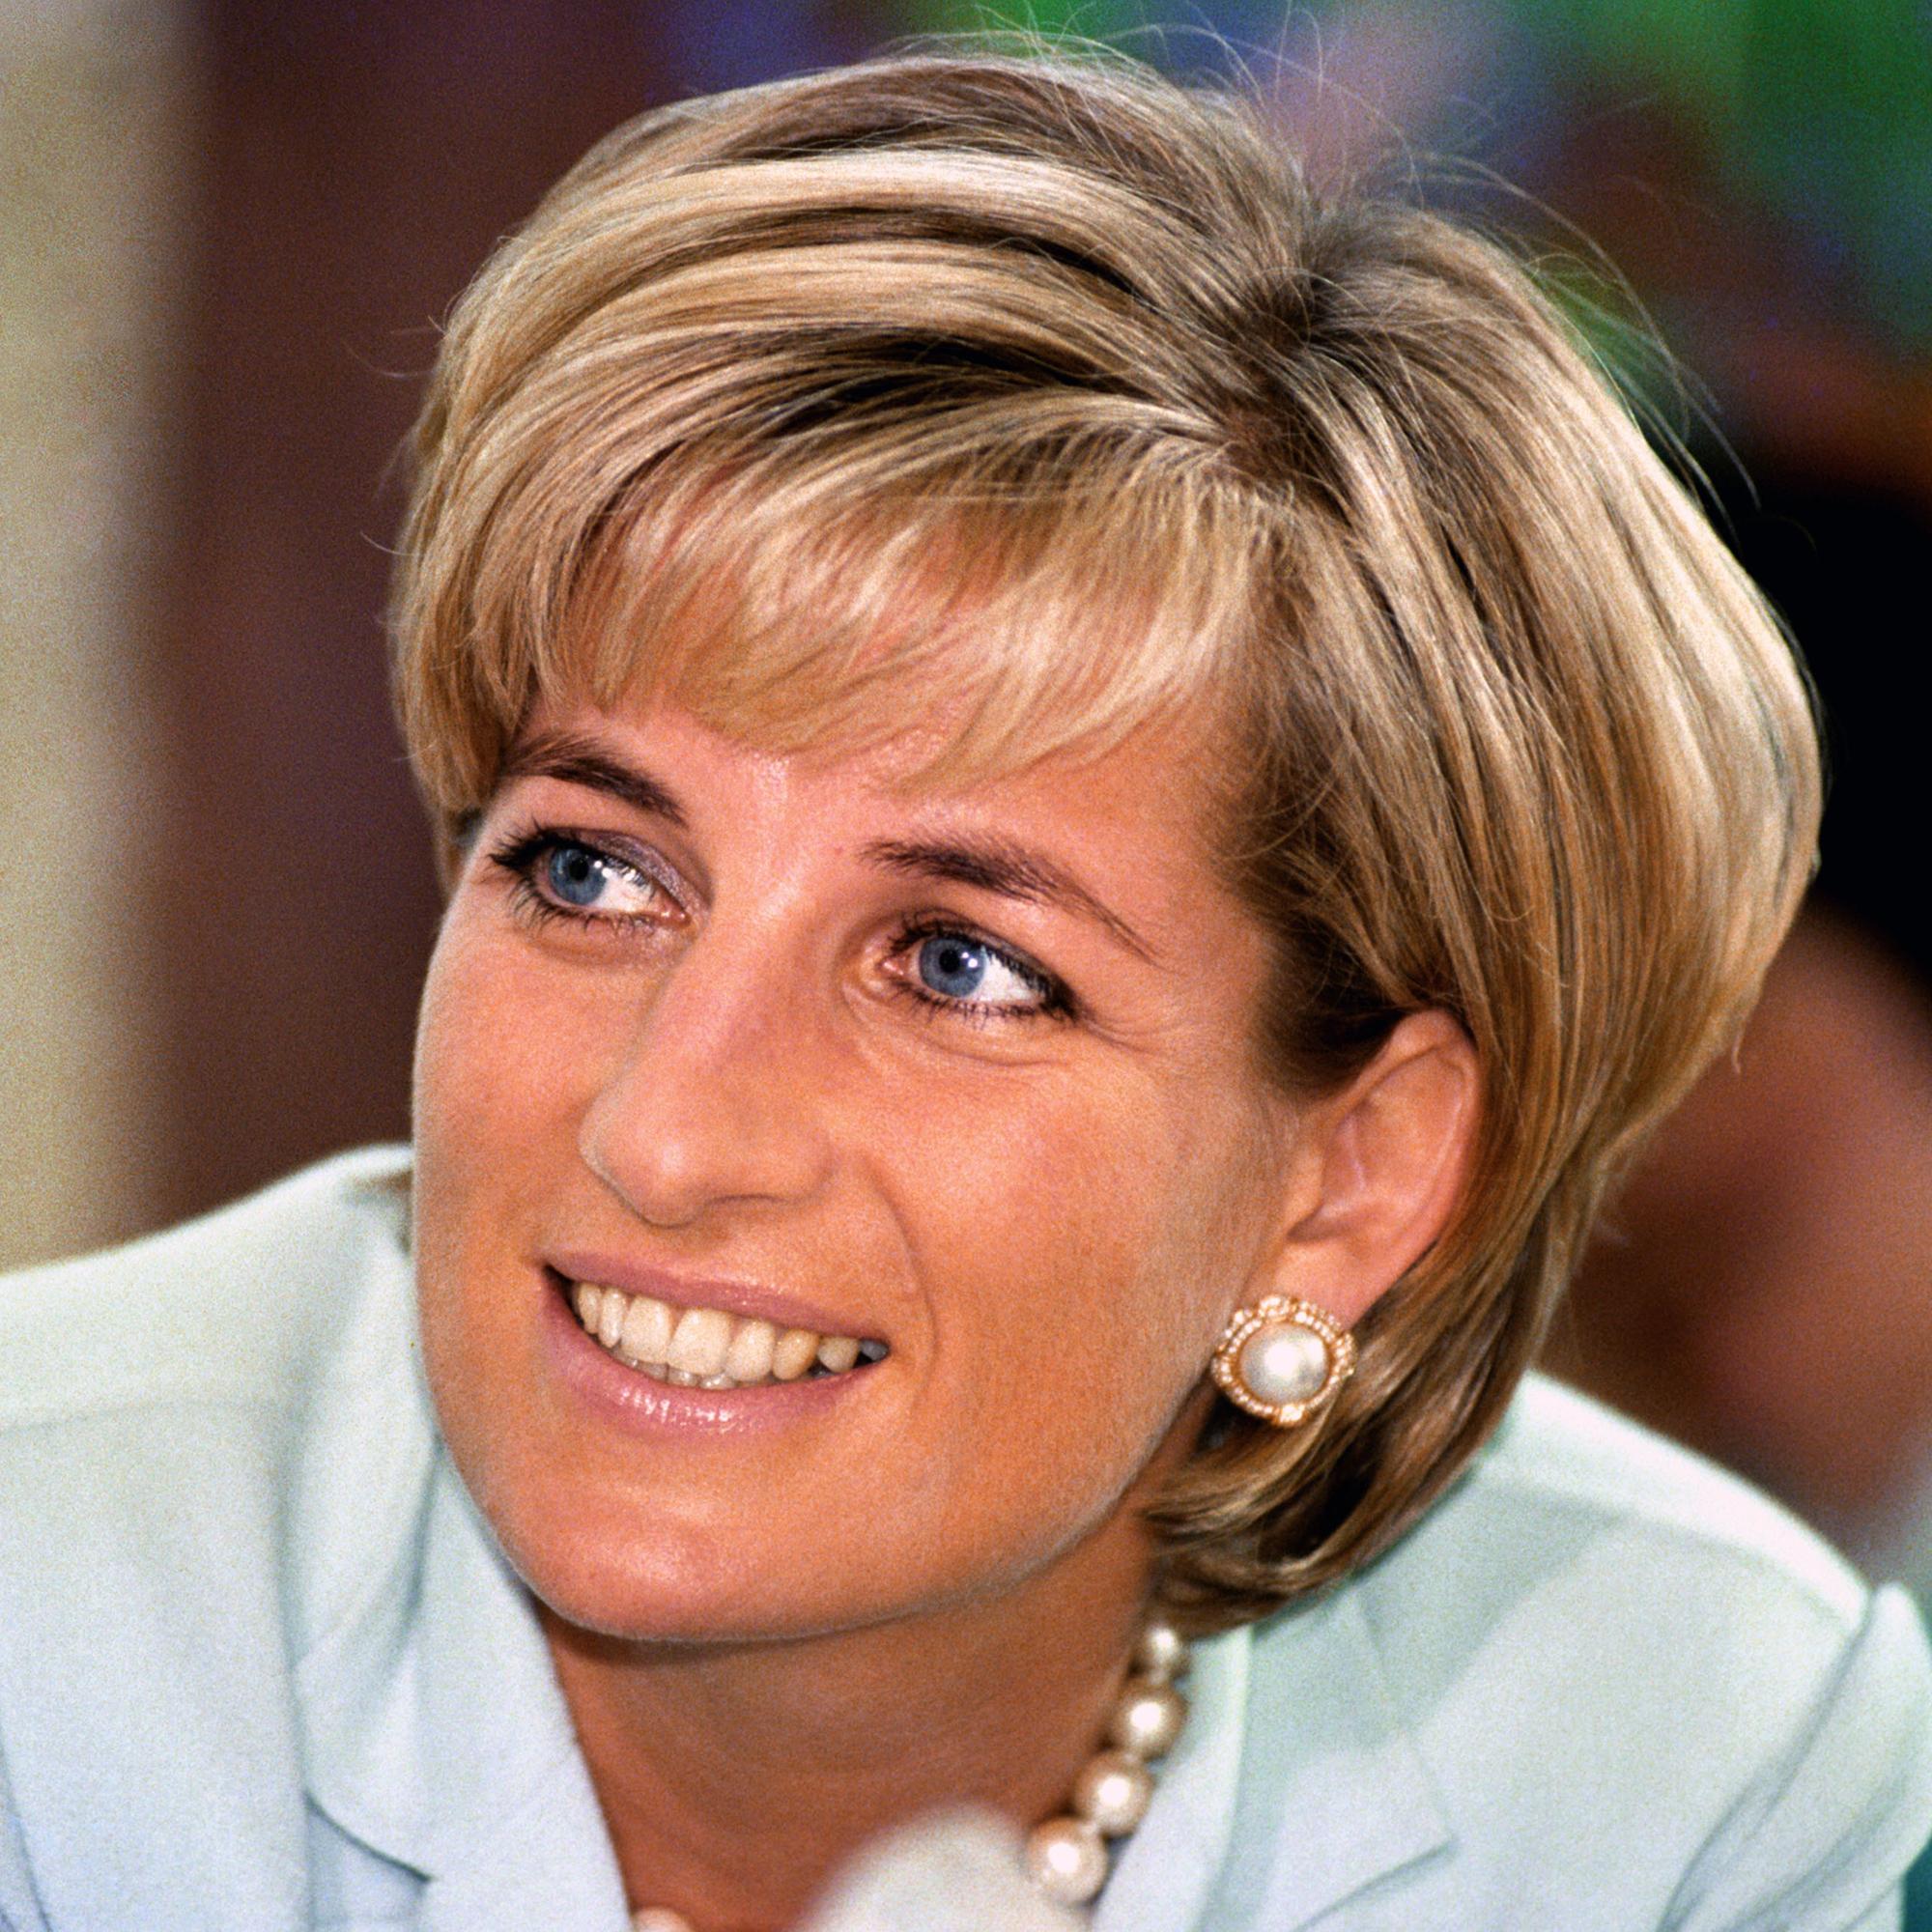 Royal Family: News, Photos & Videos - TODAY.com | TODAY